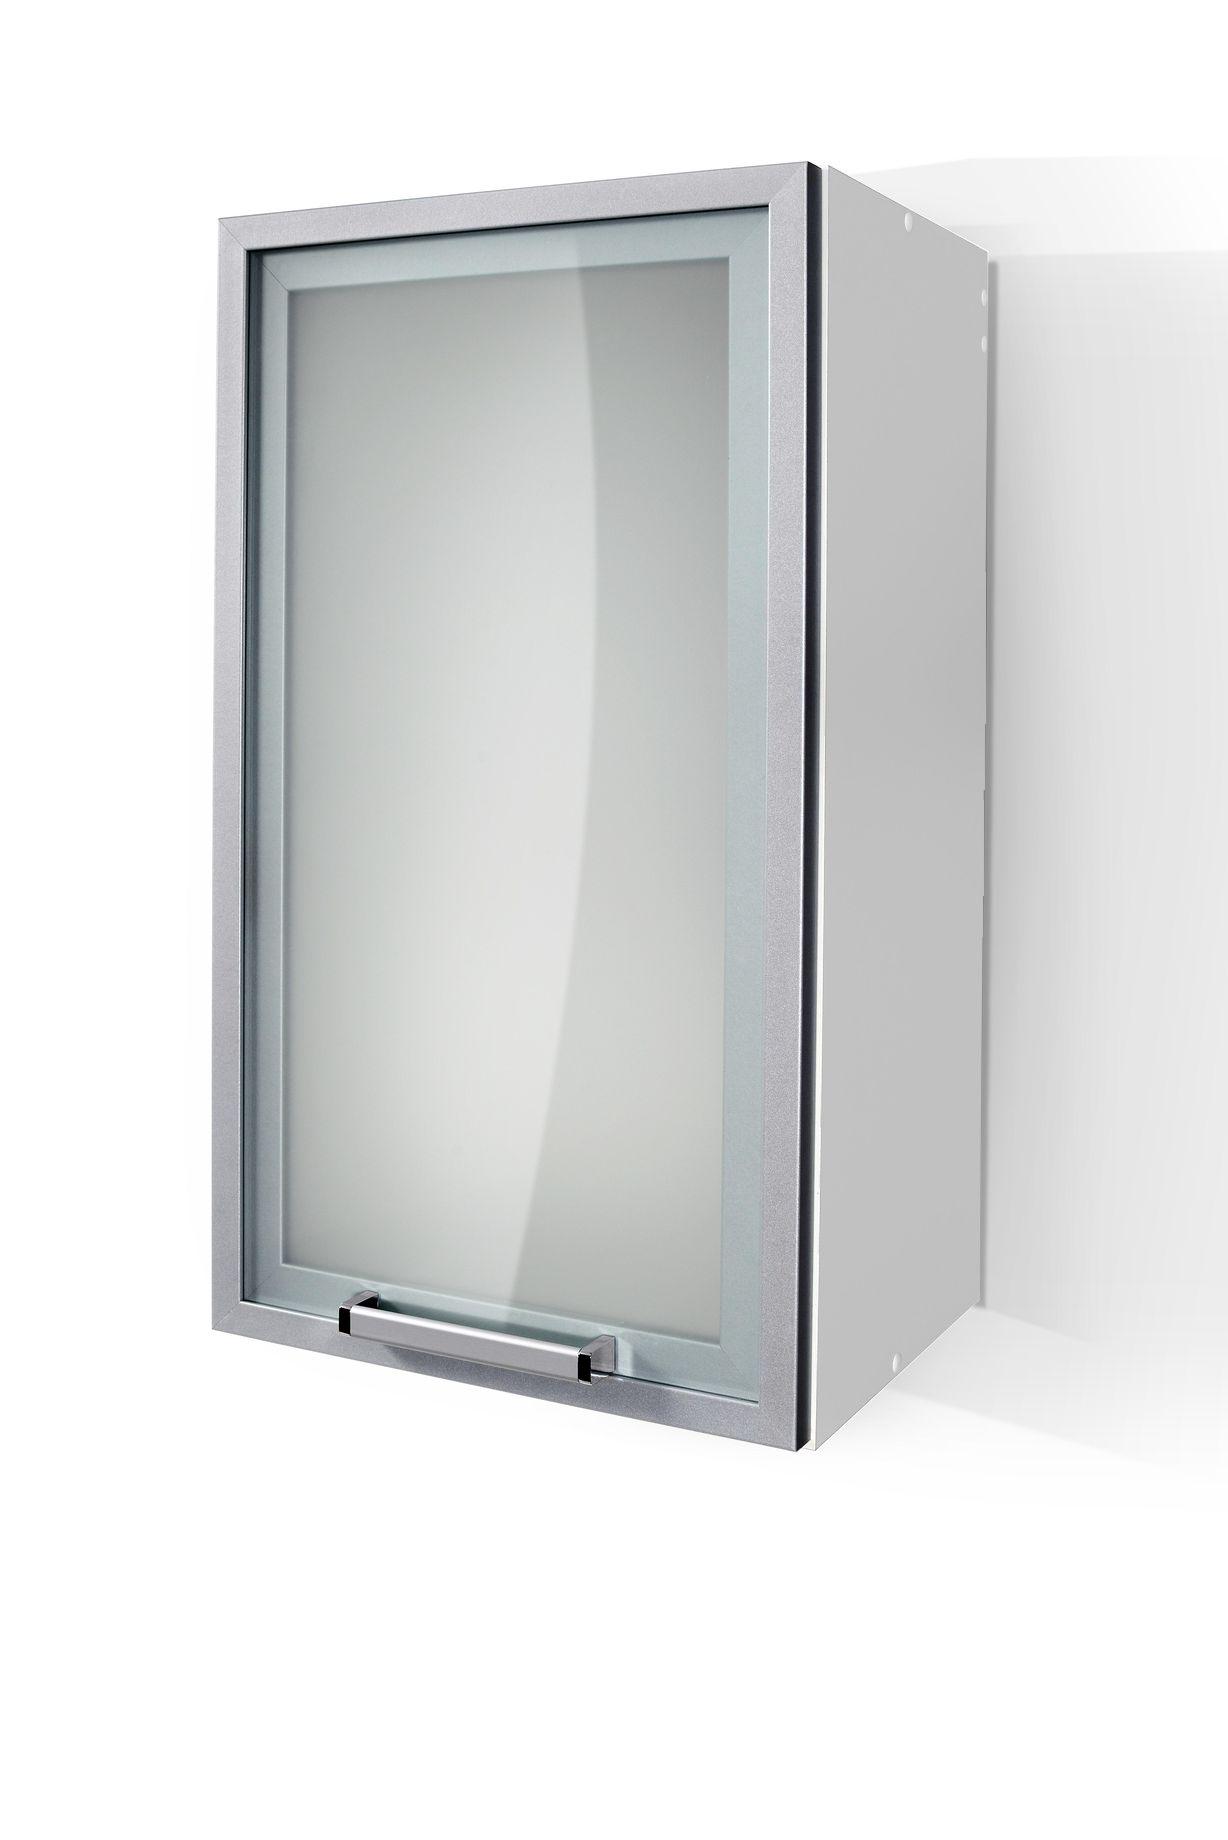 Silver Door Wall Cabinet W40SA